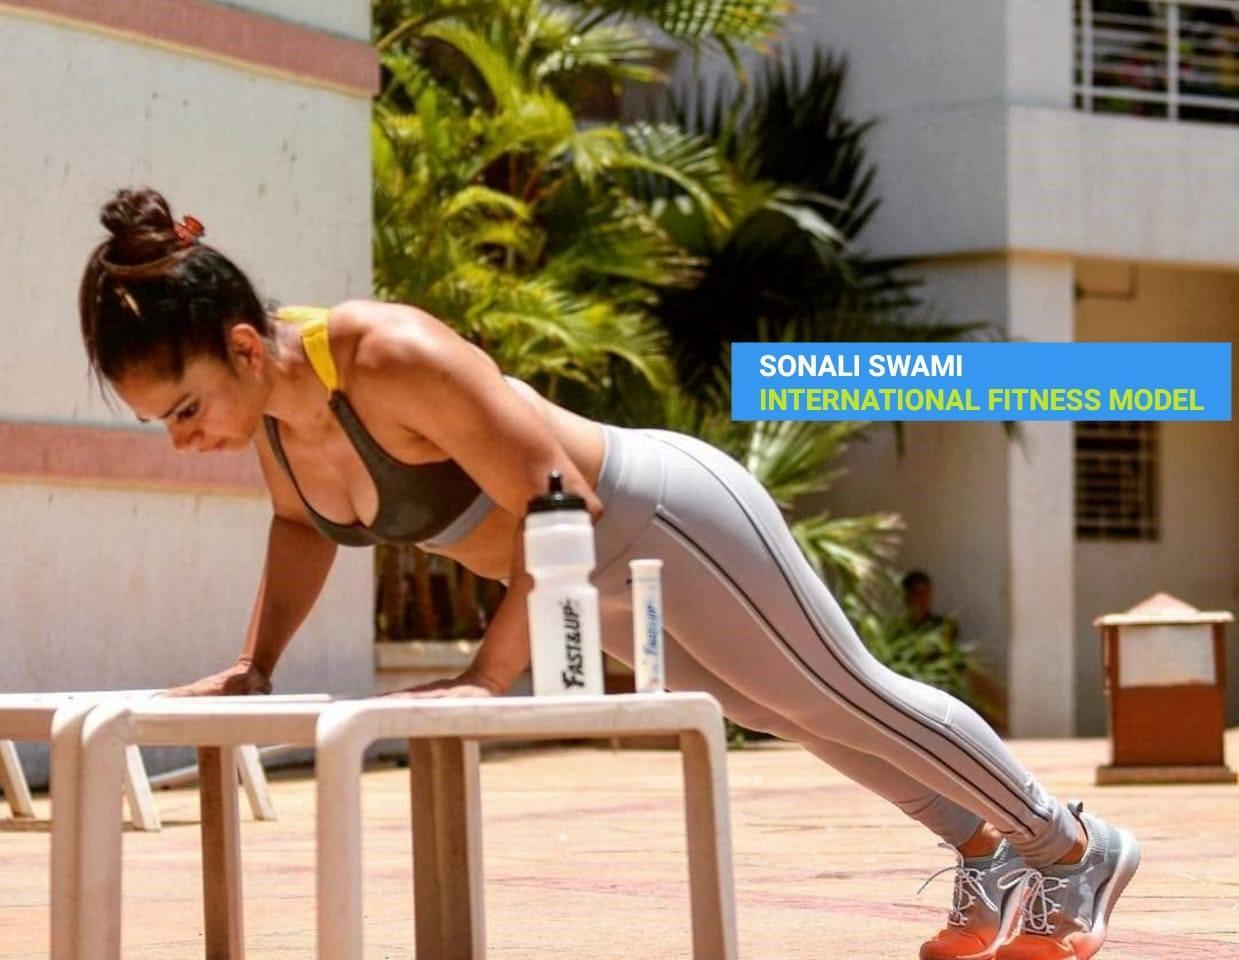 Sonali Swami, an international fitness model doing inclined push ups